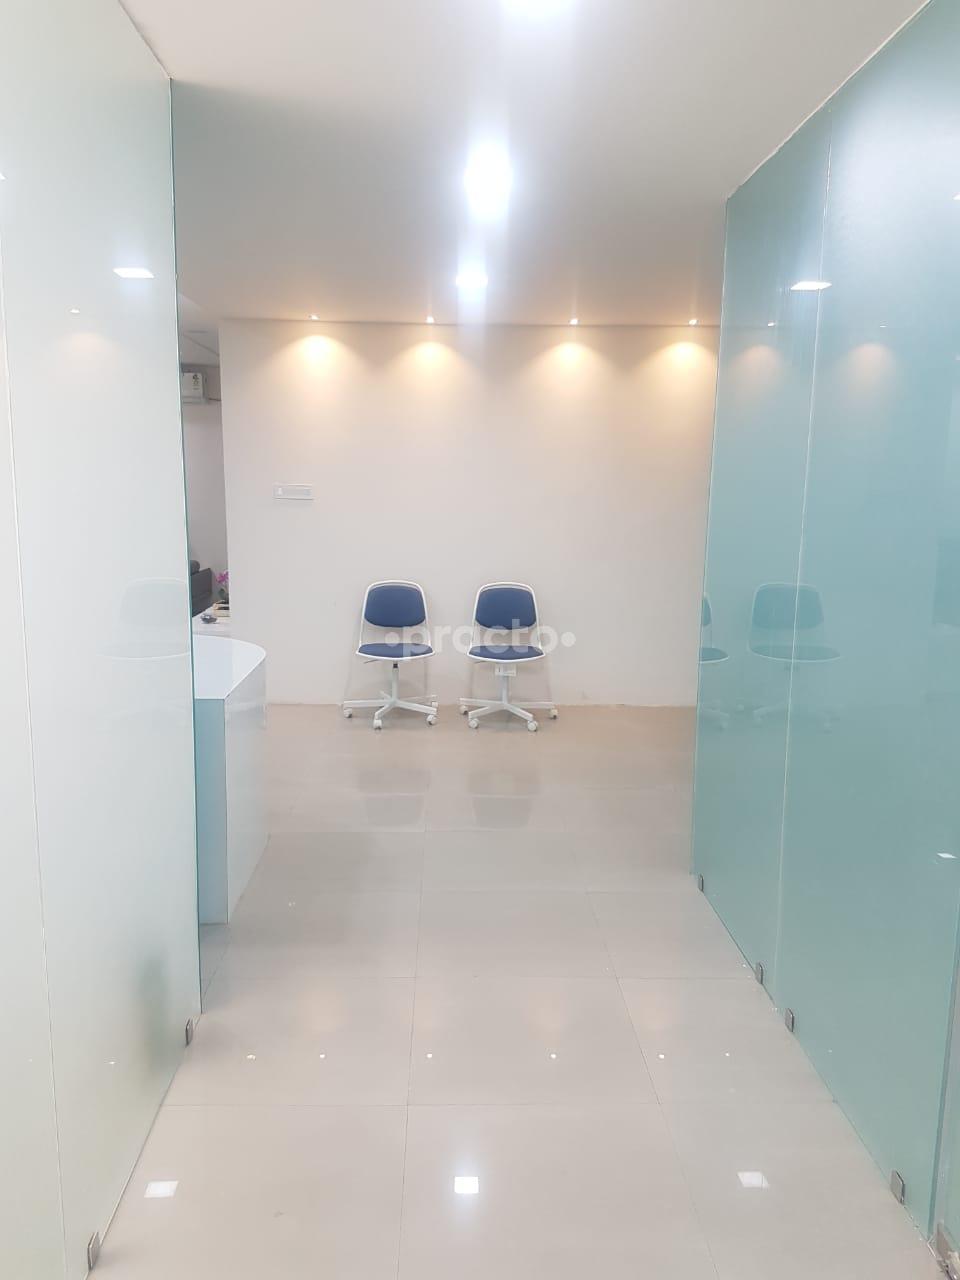 Best Skin Clinics in Mehdipatnam, Hyderabad - Book